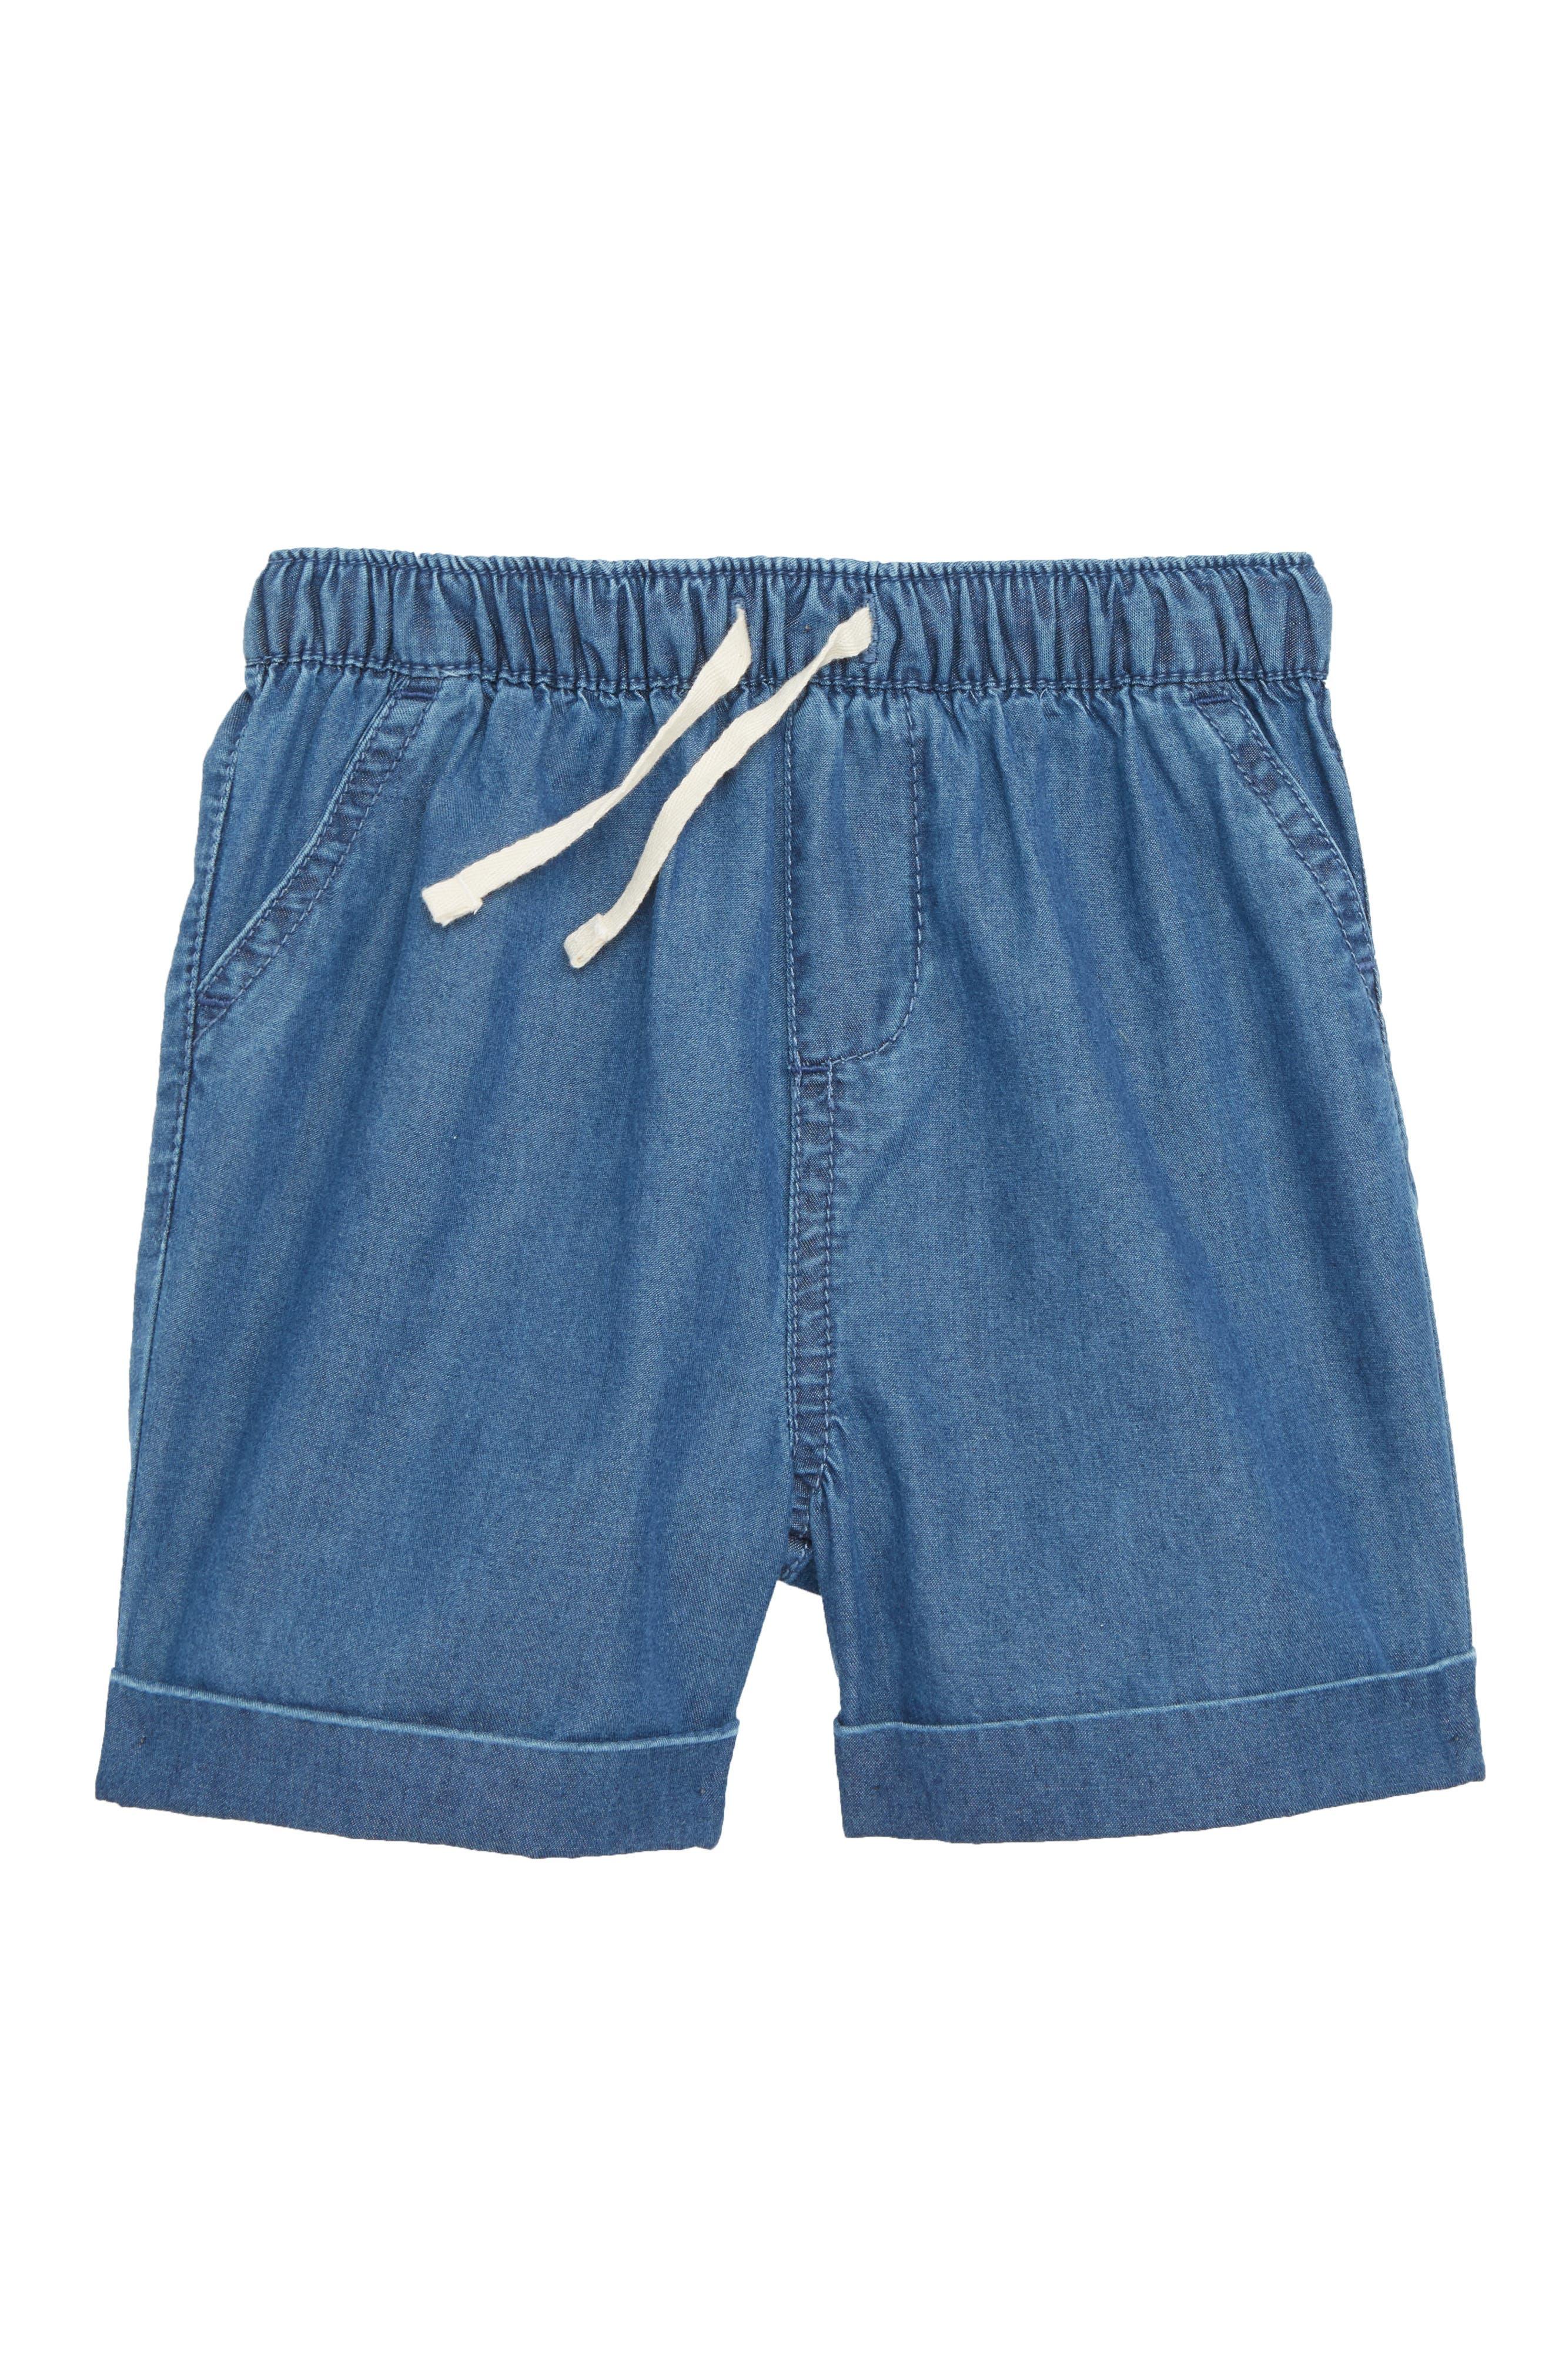 Explorer Shorts,                         Main,                         color, 469